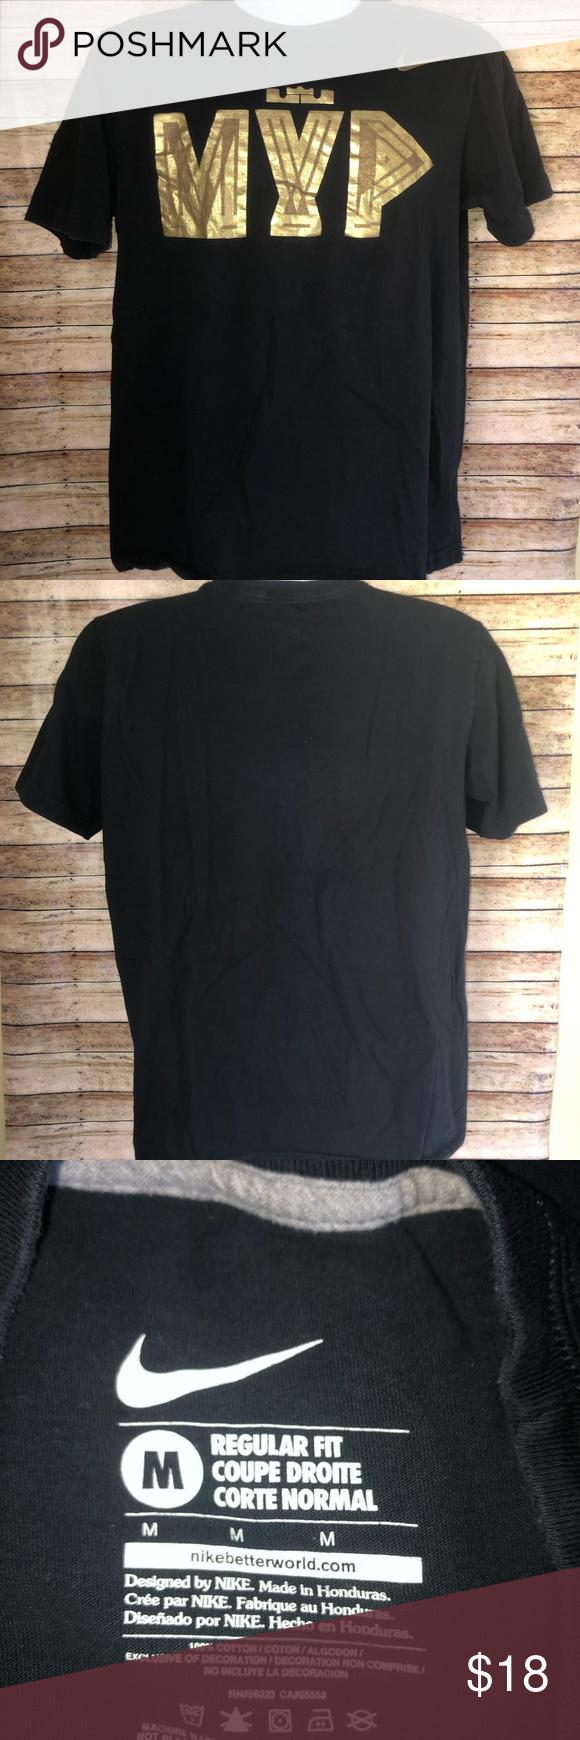 Nike Lebron James Mvp King Logo Black T Shirt M Black Tshirt Nike Nike Lebron [ 1740 x 580 Pixel ]